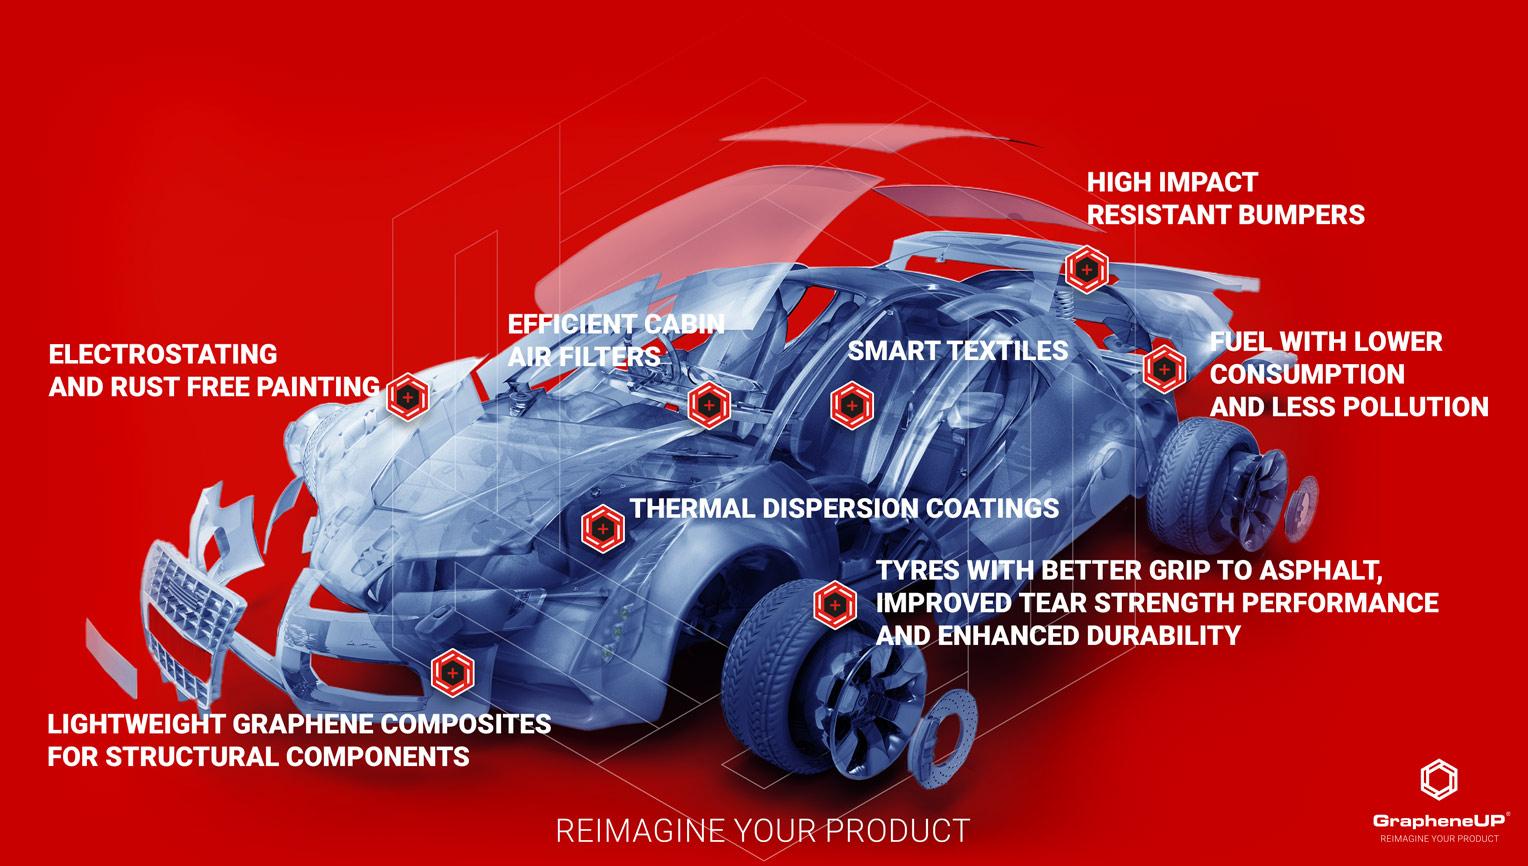 graphene enhanced product cars